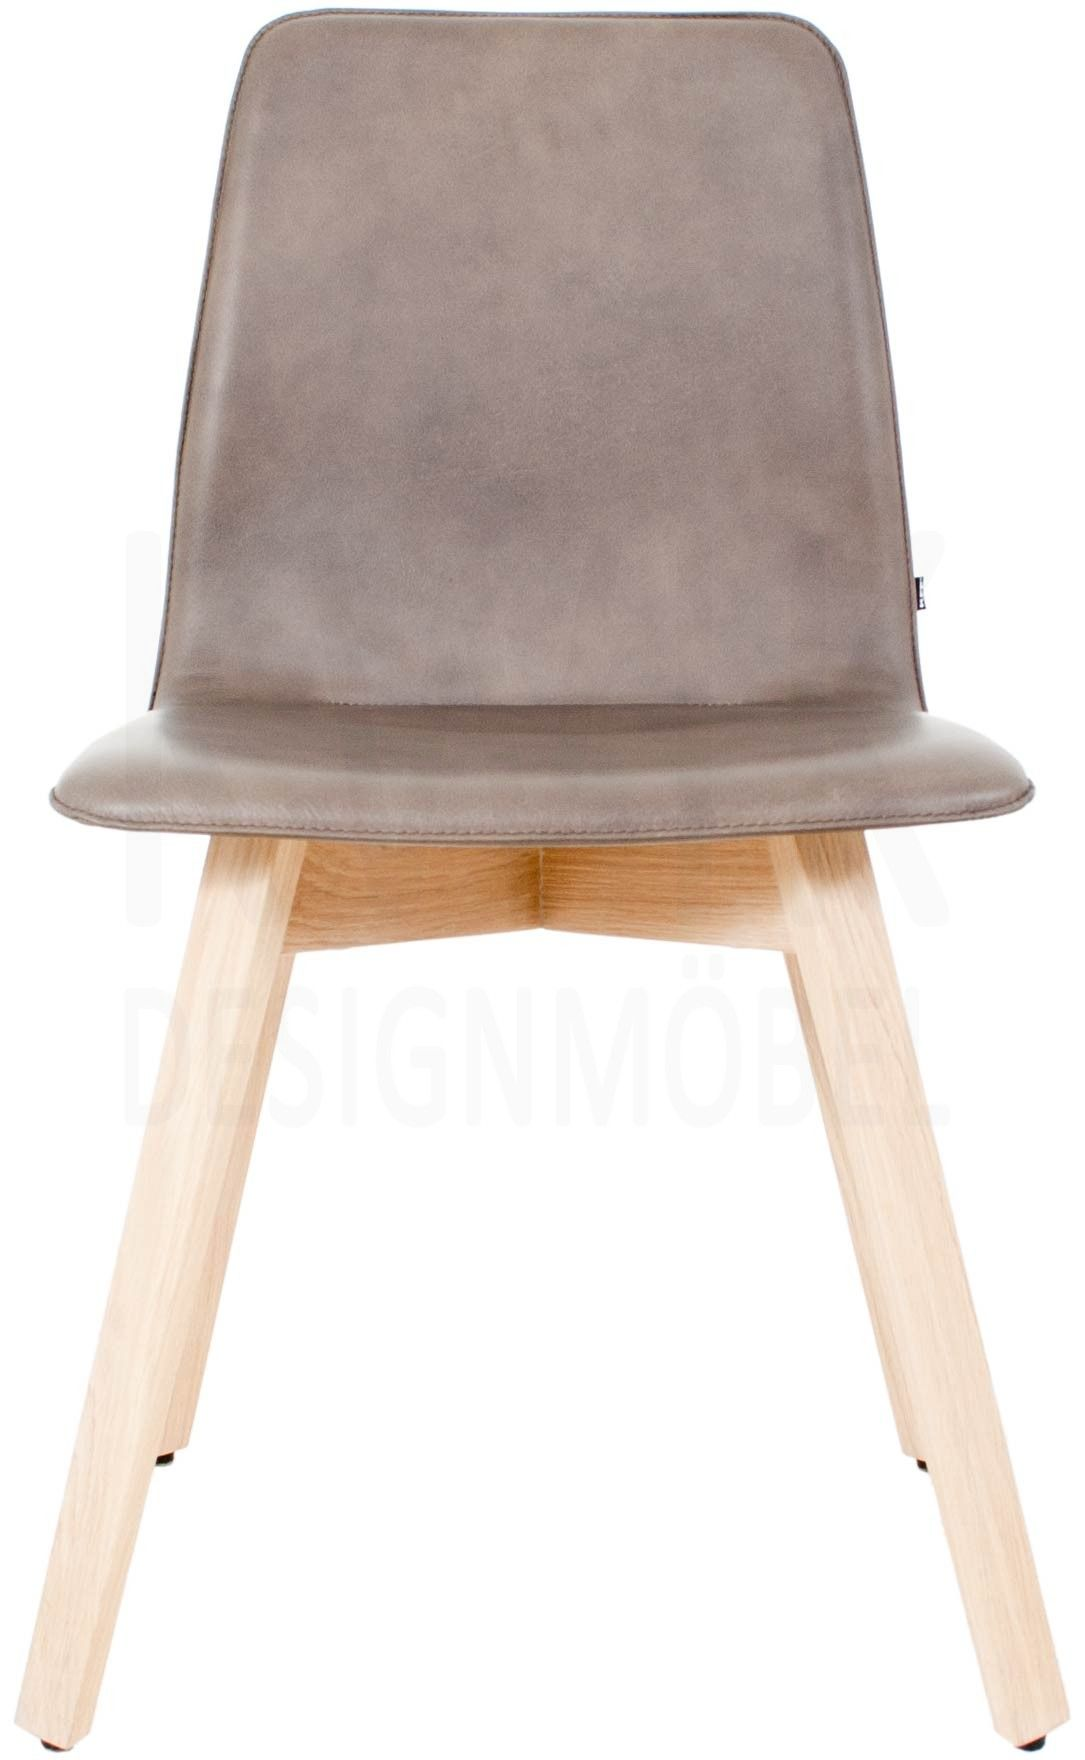 kff maverick polster stuhl leder grau gestell eiche weiss kff shop stuhl pinterest. Black Bedroom Furniture Sets. Home Design Ideas